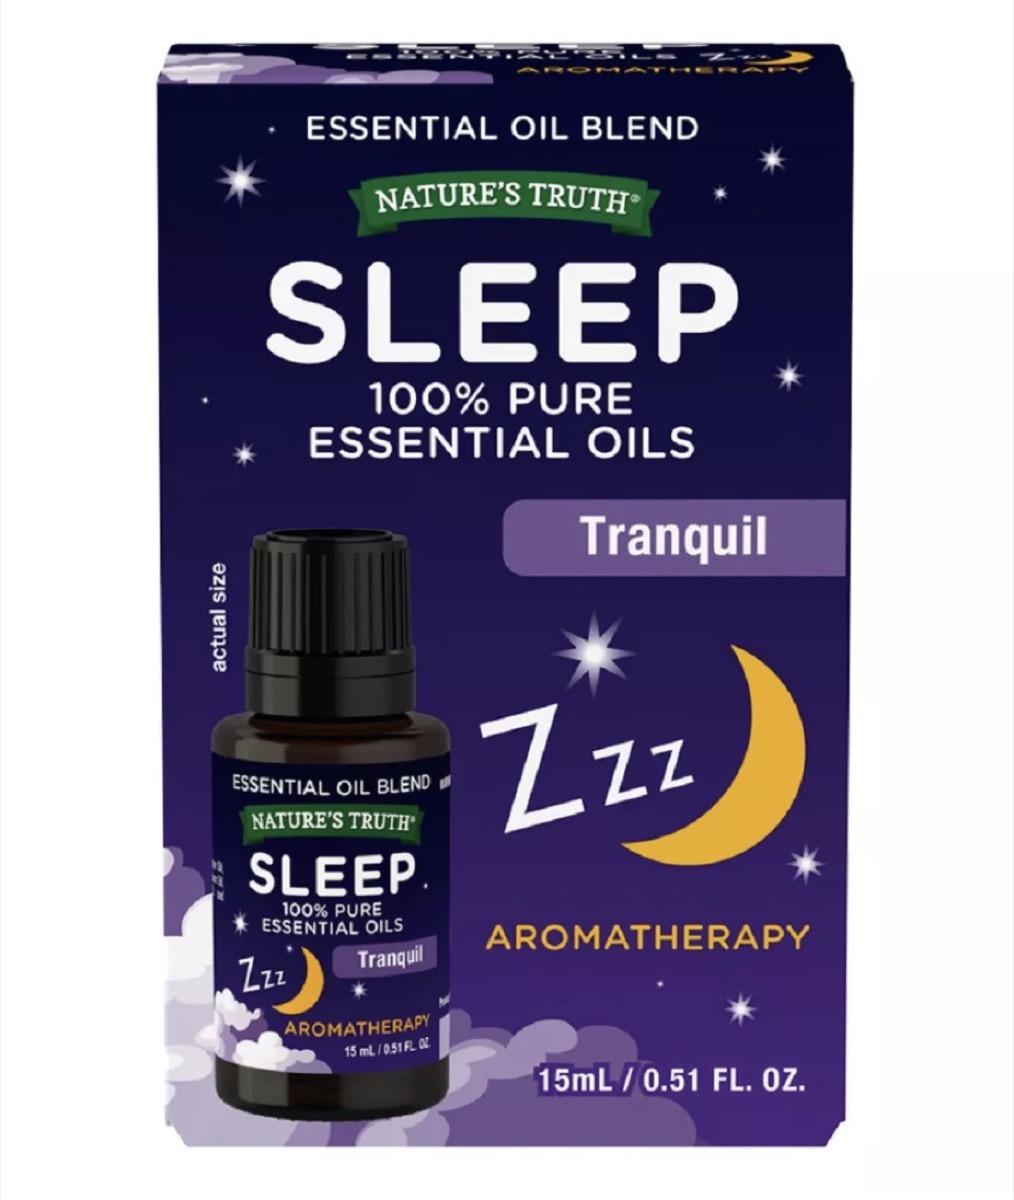 purple box of essential oils, better sleep essentials